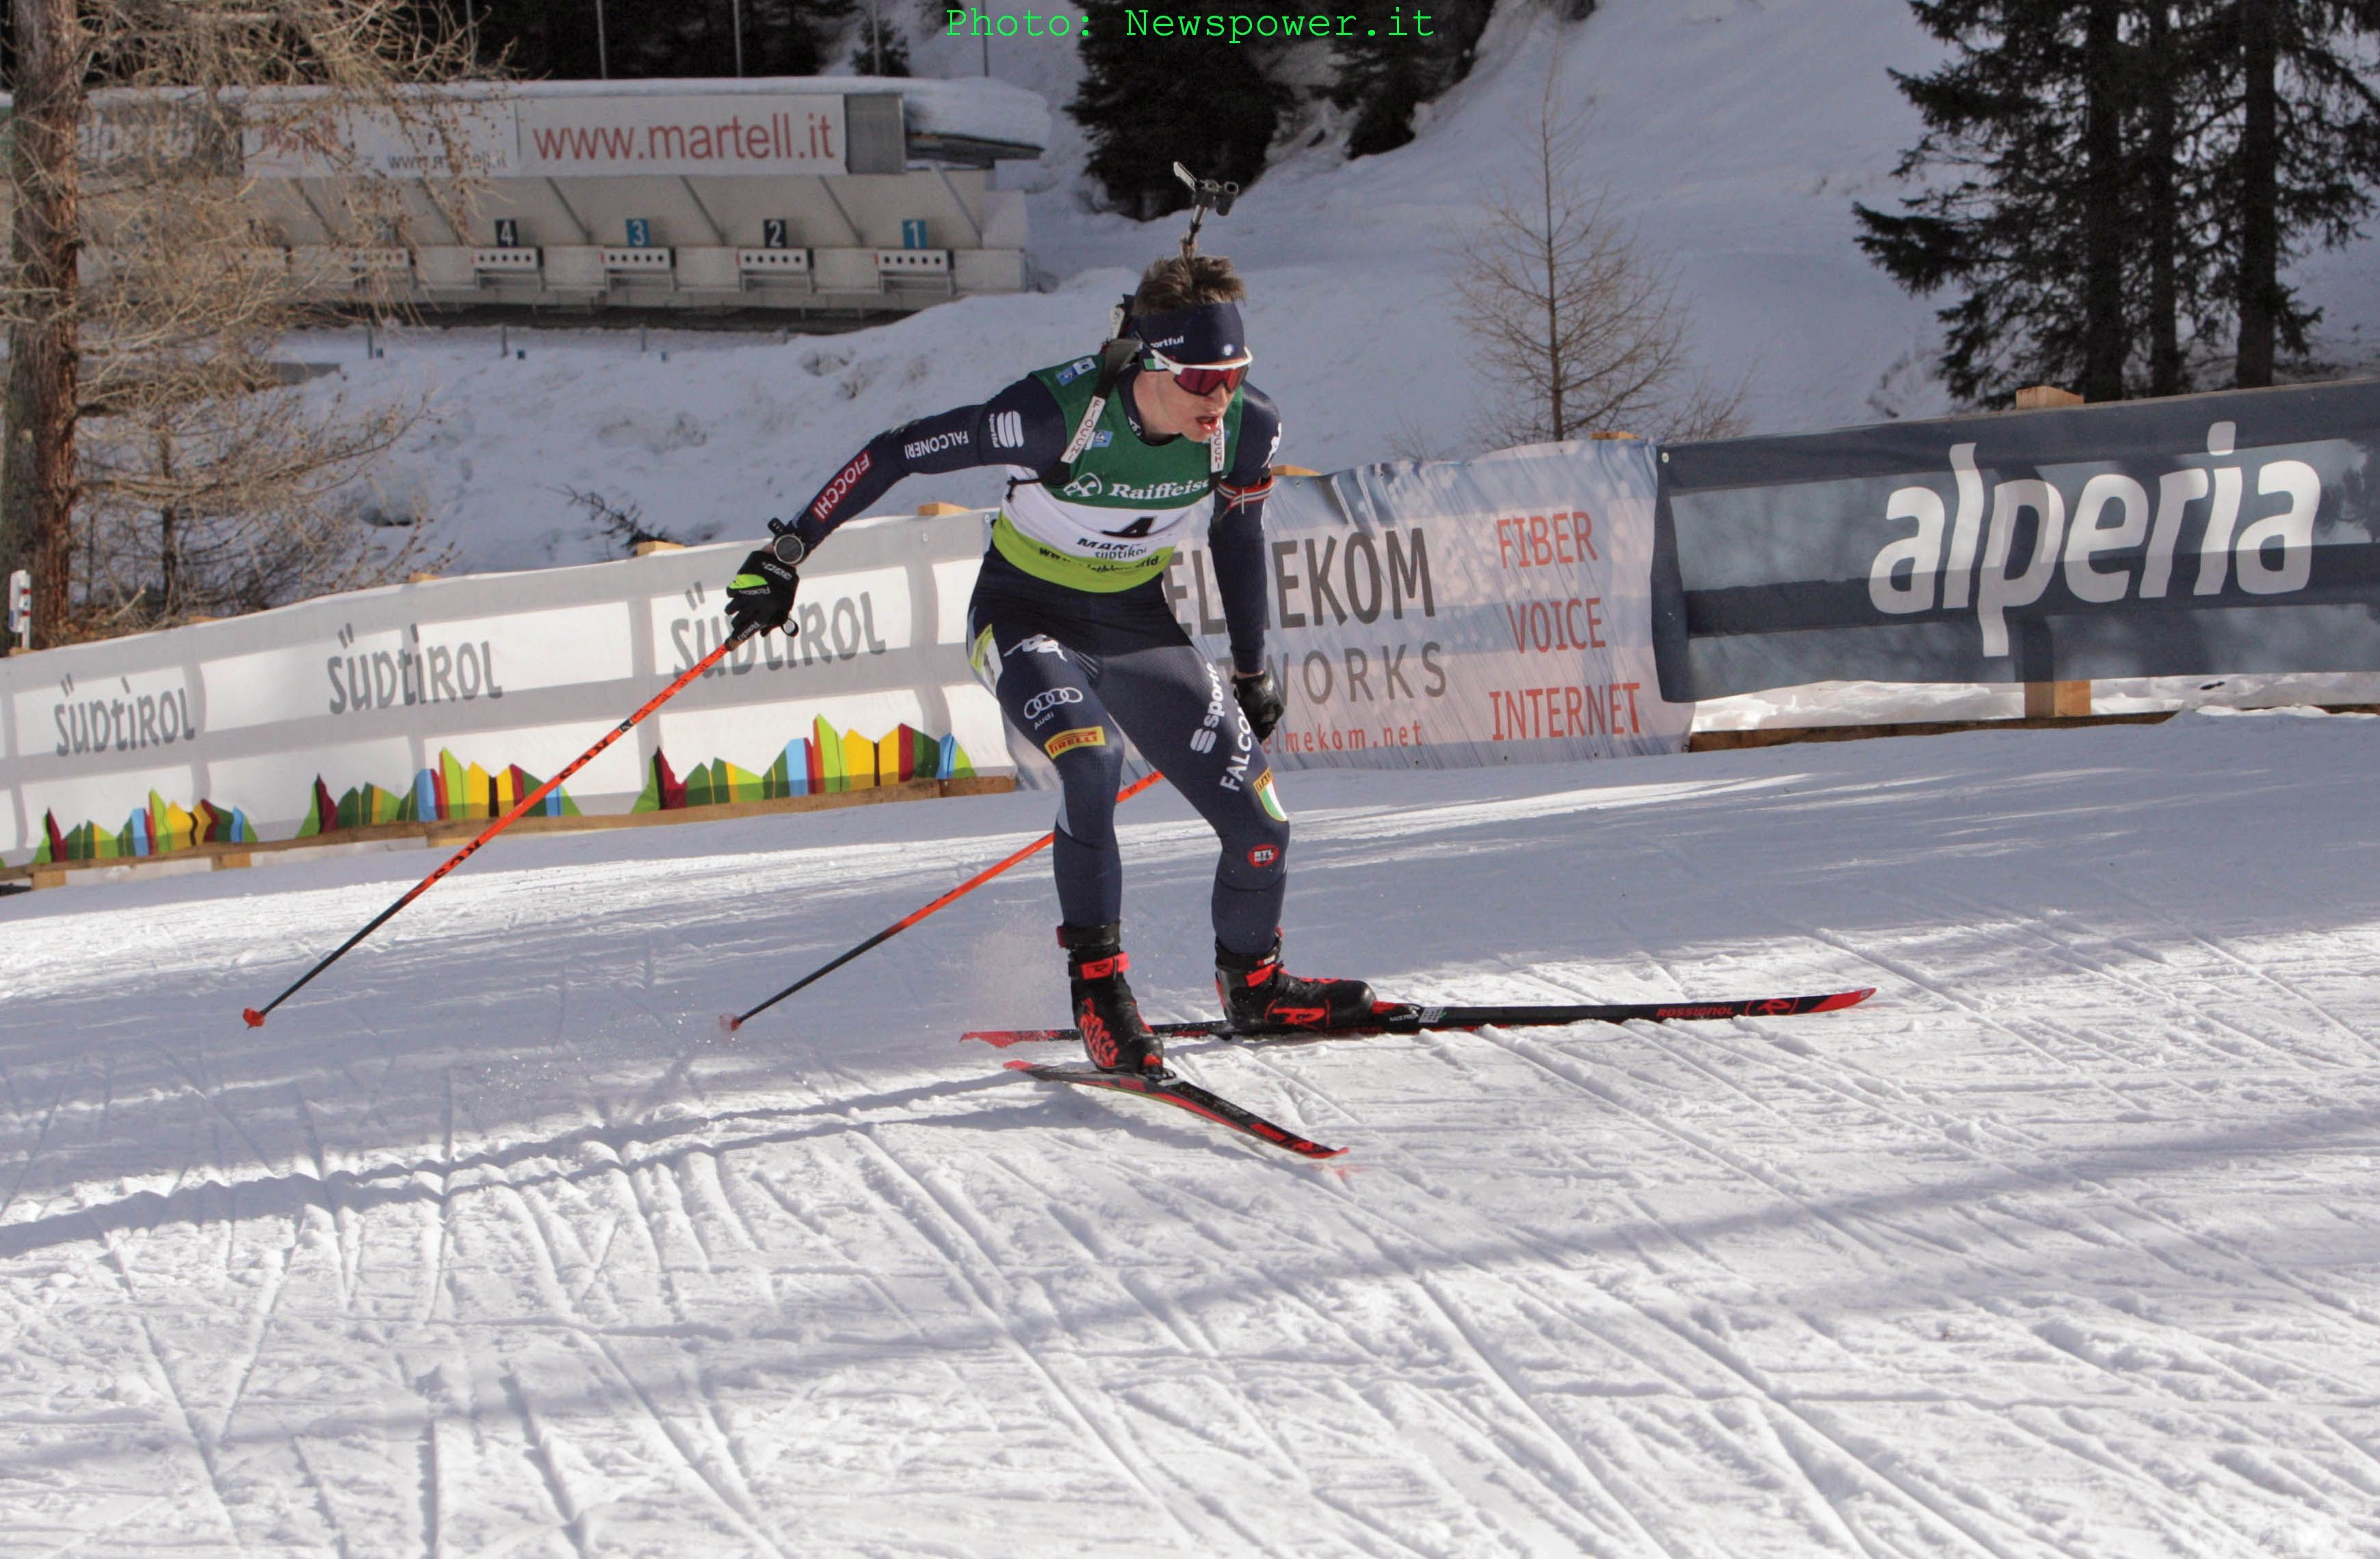 Biathlon: Didier Bionaz in evidenza in Coppa del Mondo